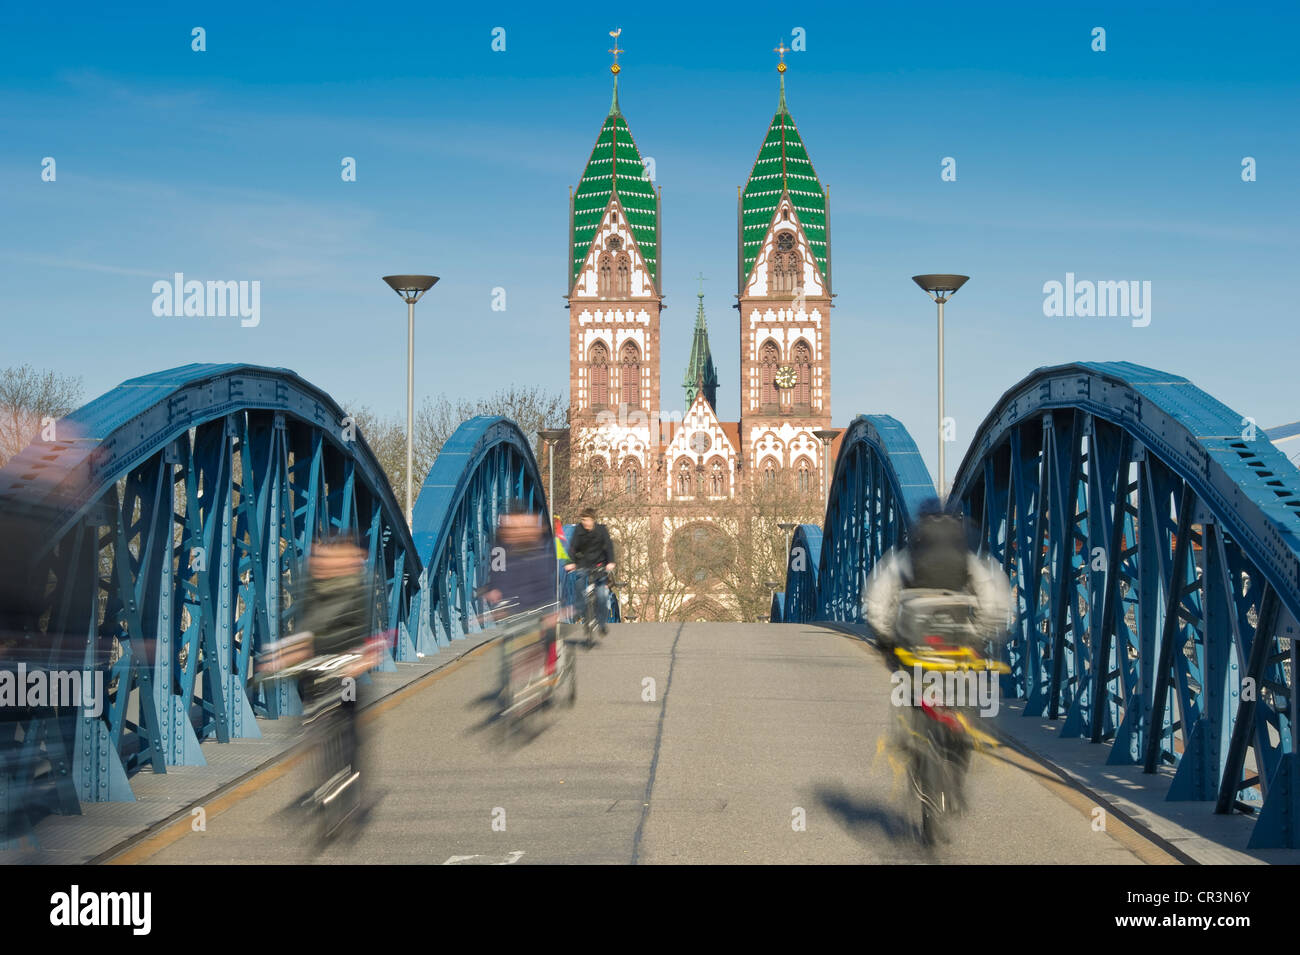 Cyclists, motion blur, Blaue Bruecke bridge, Freiburg im Breisgau, Baden-Wuerttemberg, Germany, Europe - Stock Image